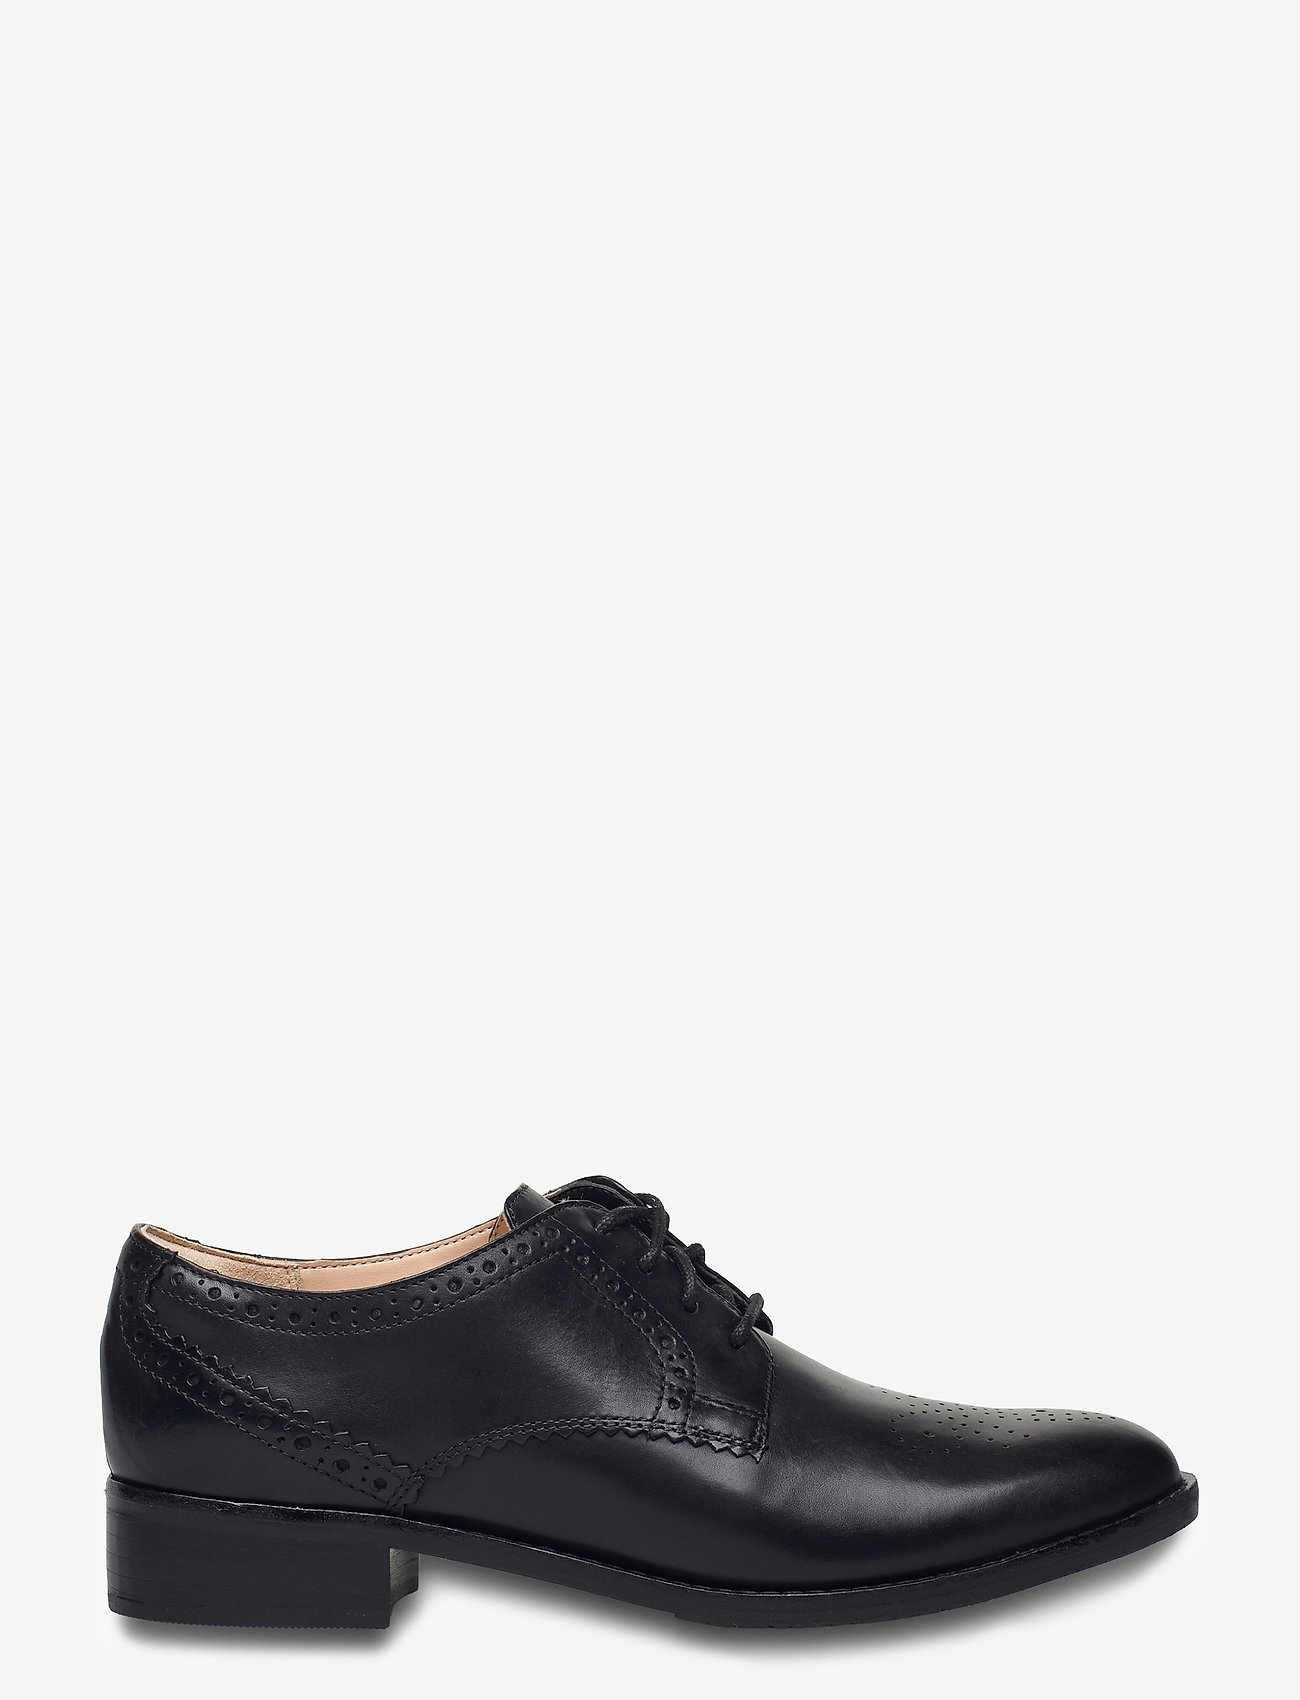 Clarks - Netley Rose - schnürschuhe - black leather - 1